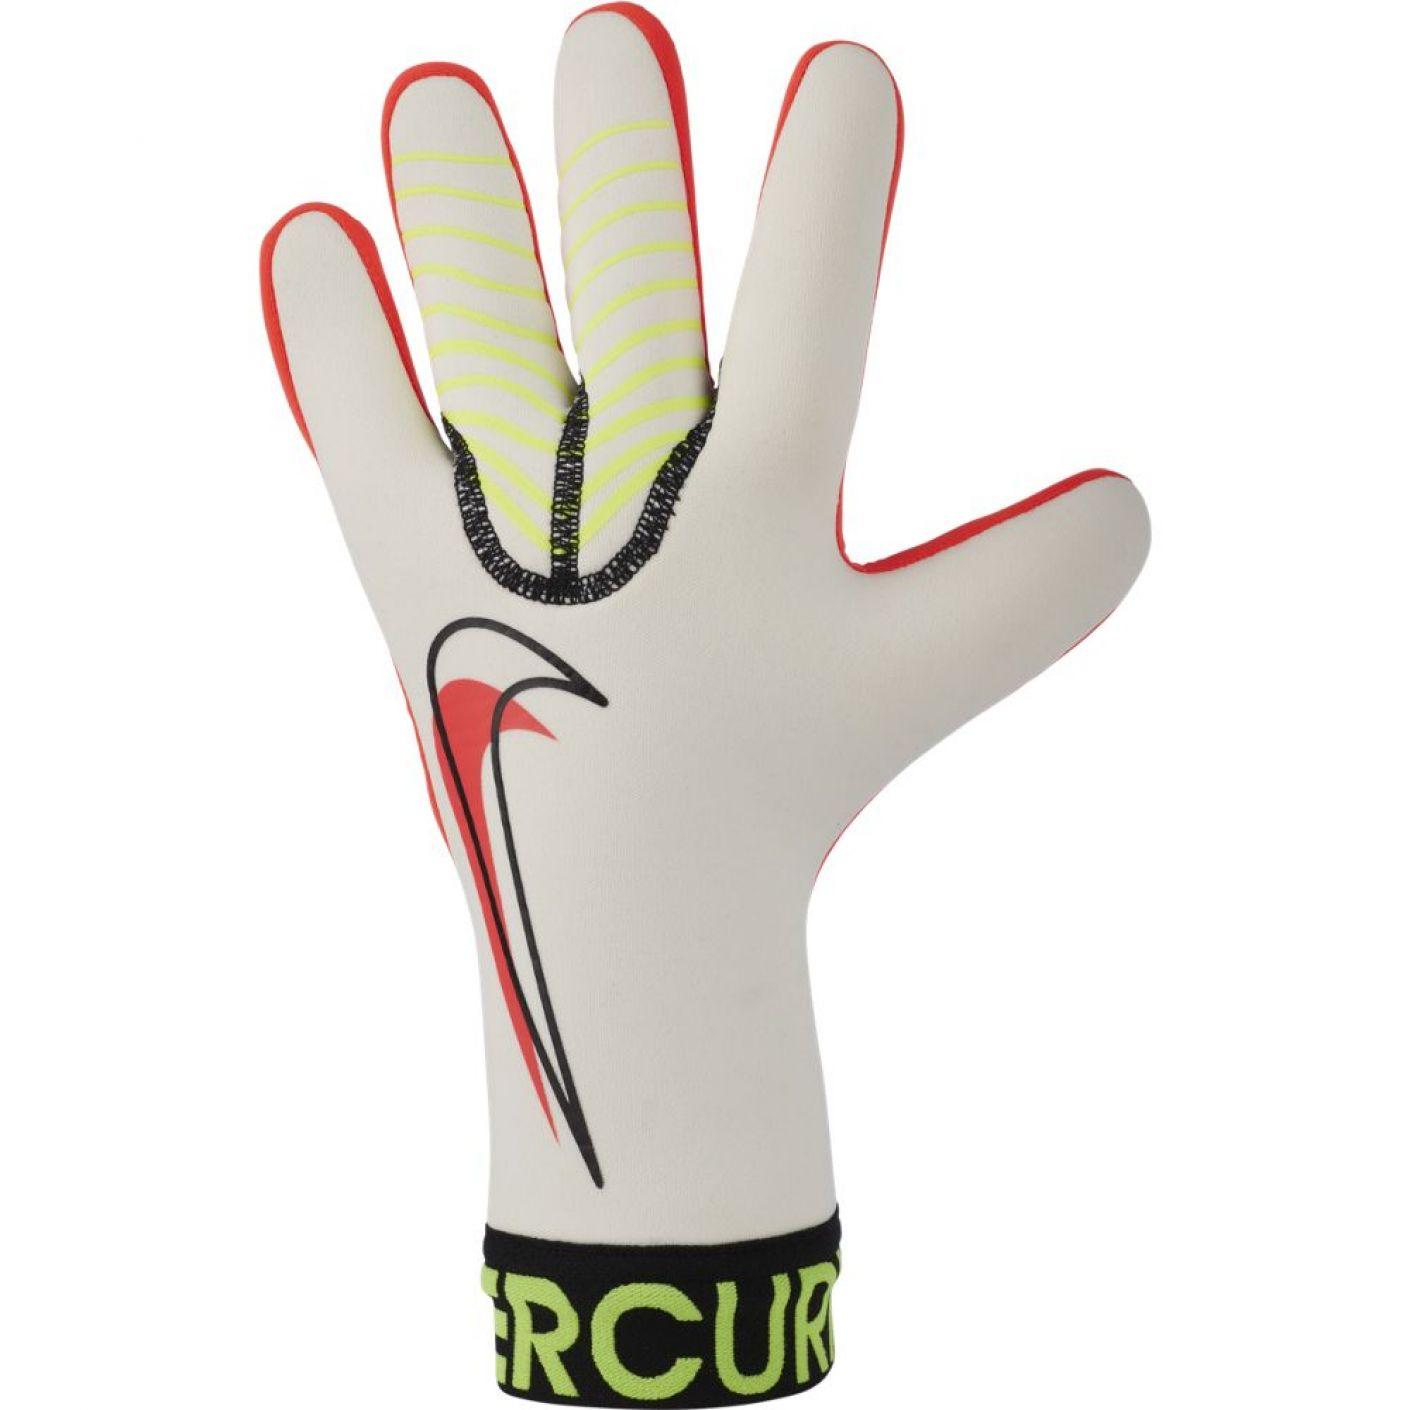 Nike Keepershandschoenen Mercurial Touch Victory Wit Geel Rood